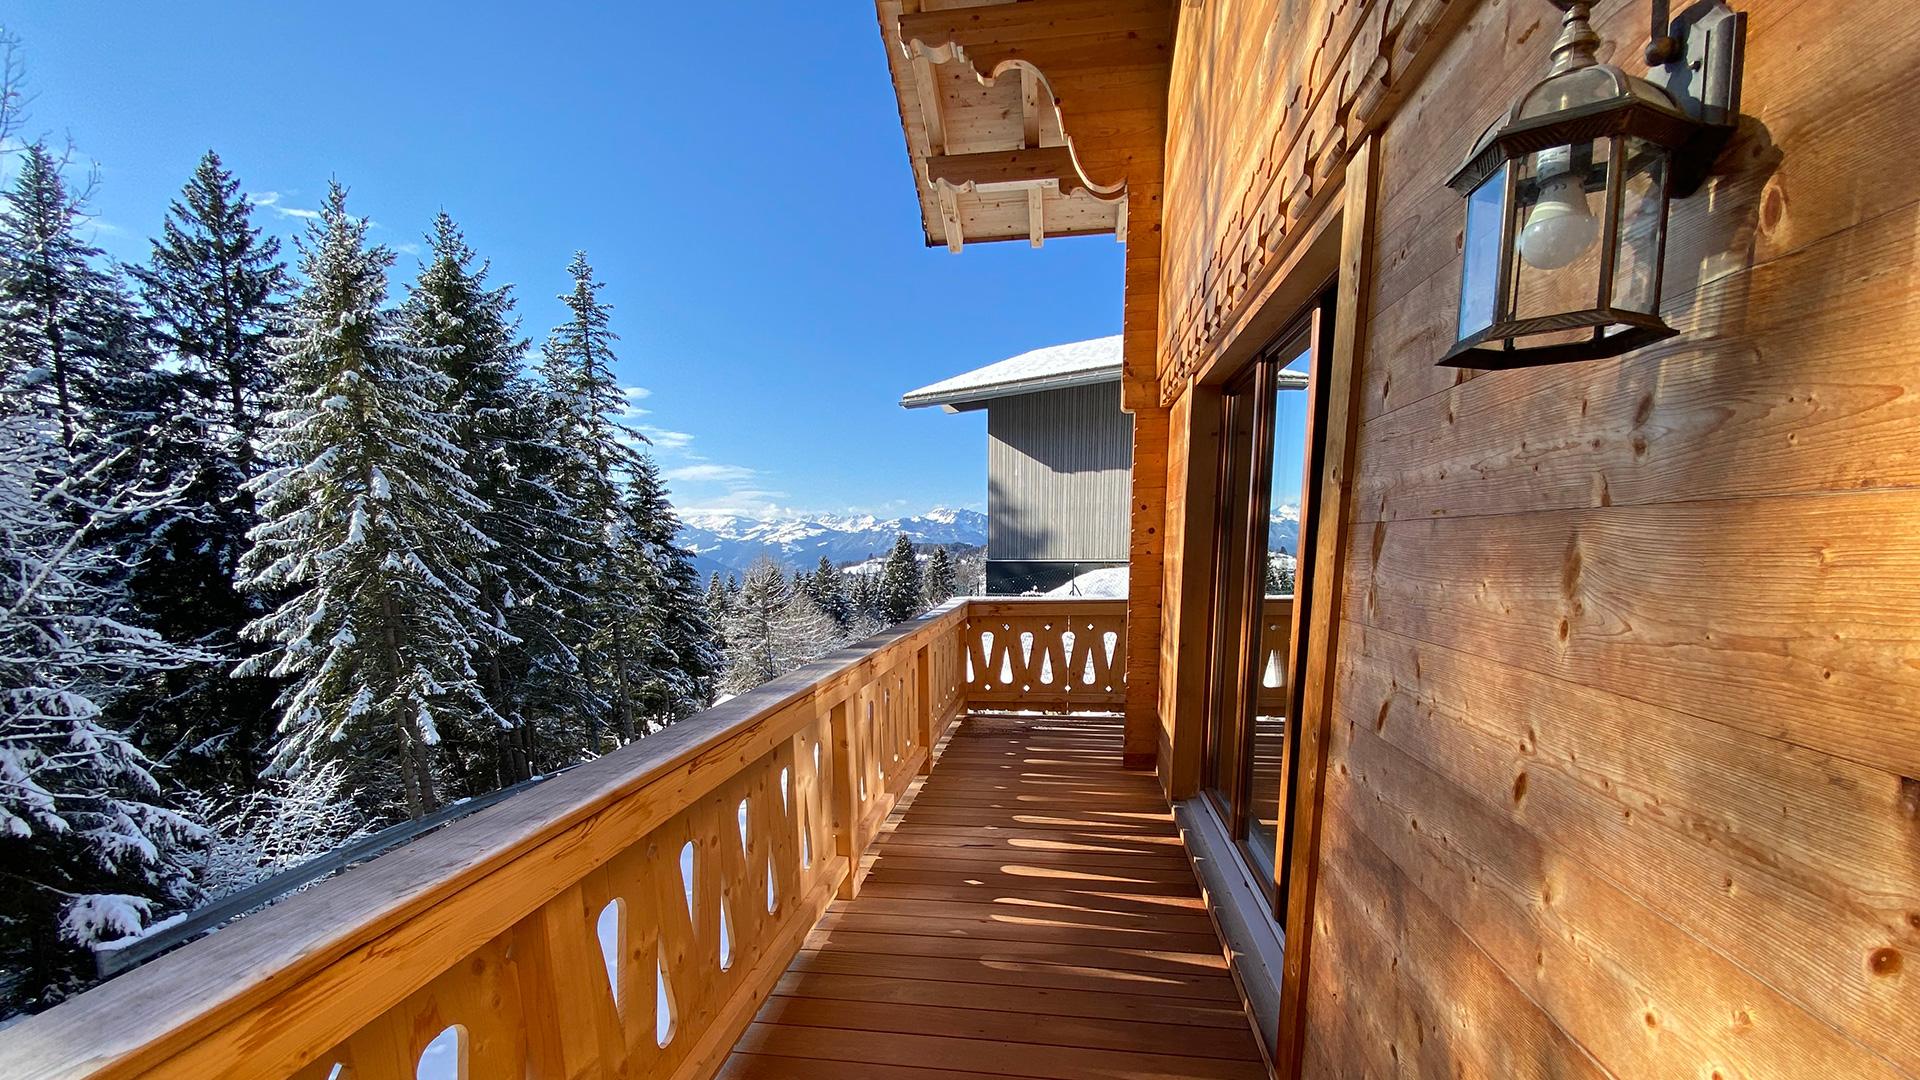 Chalet Gawa Chalet, Switzerland